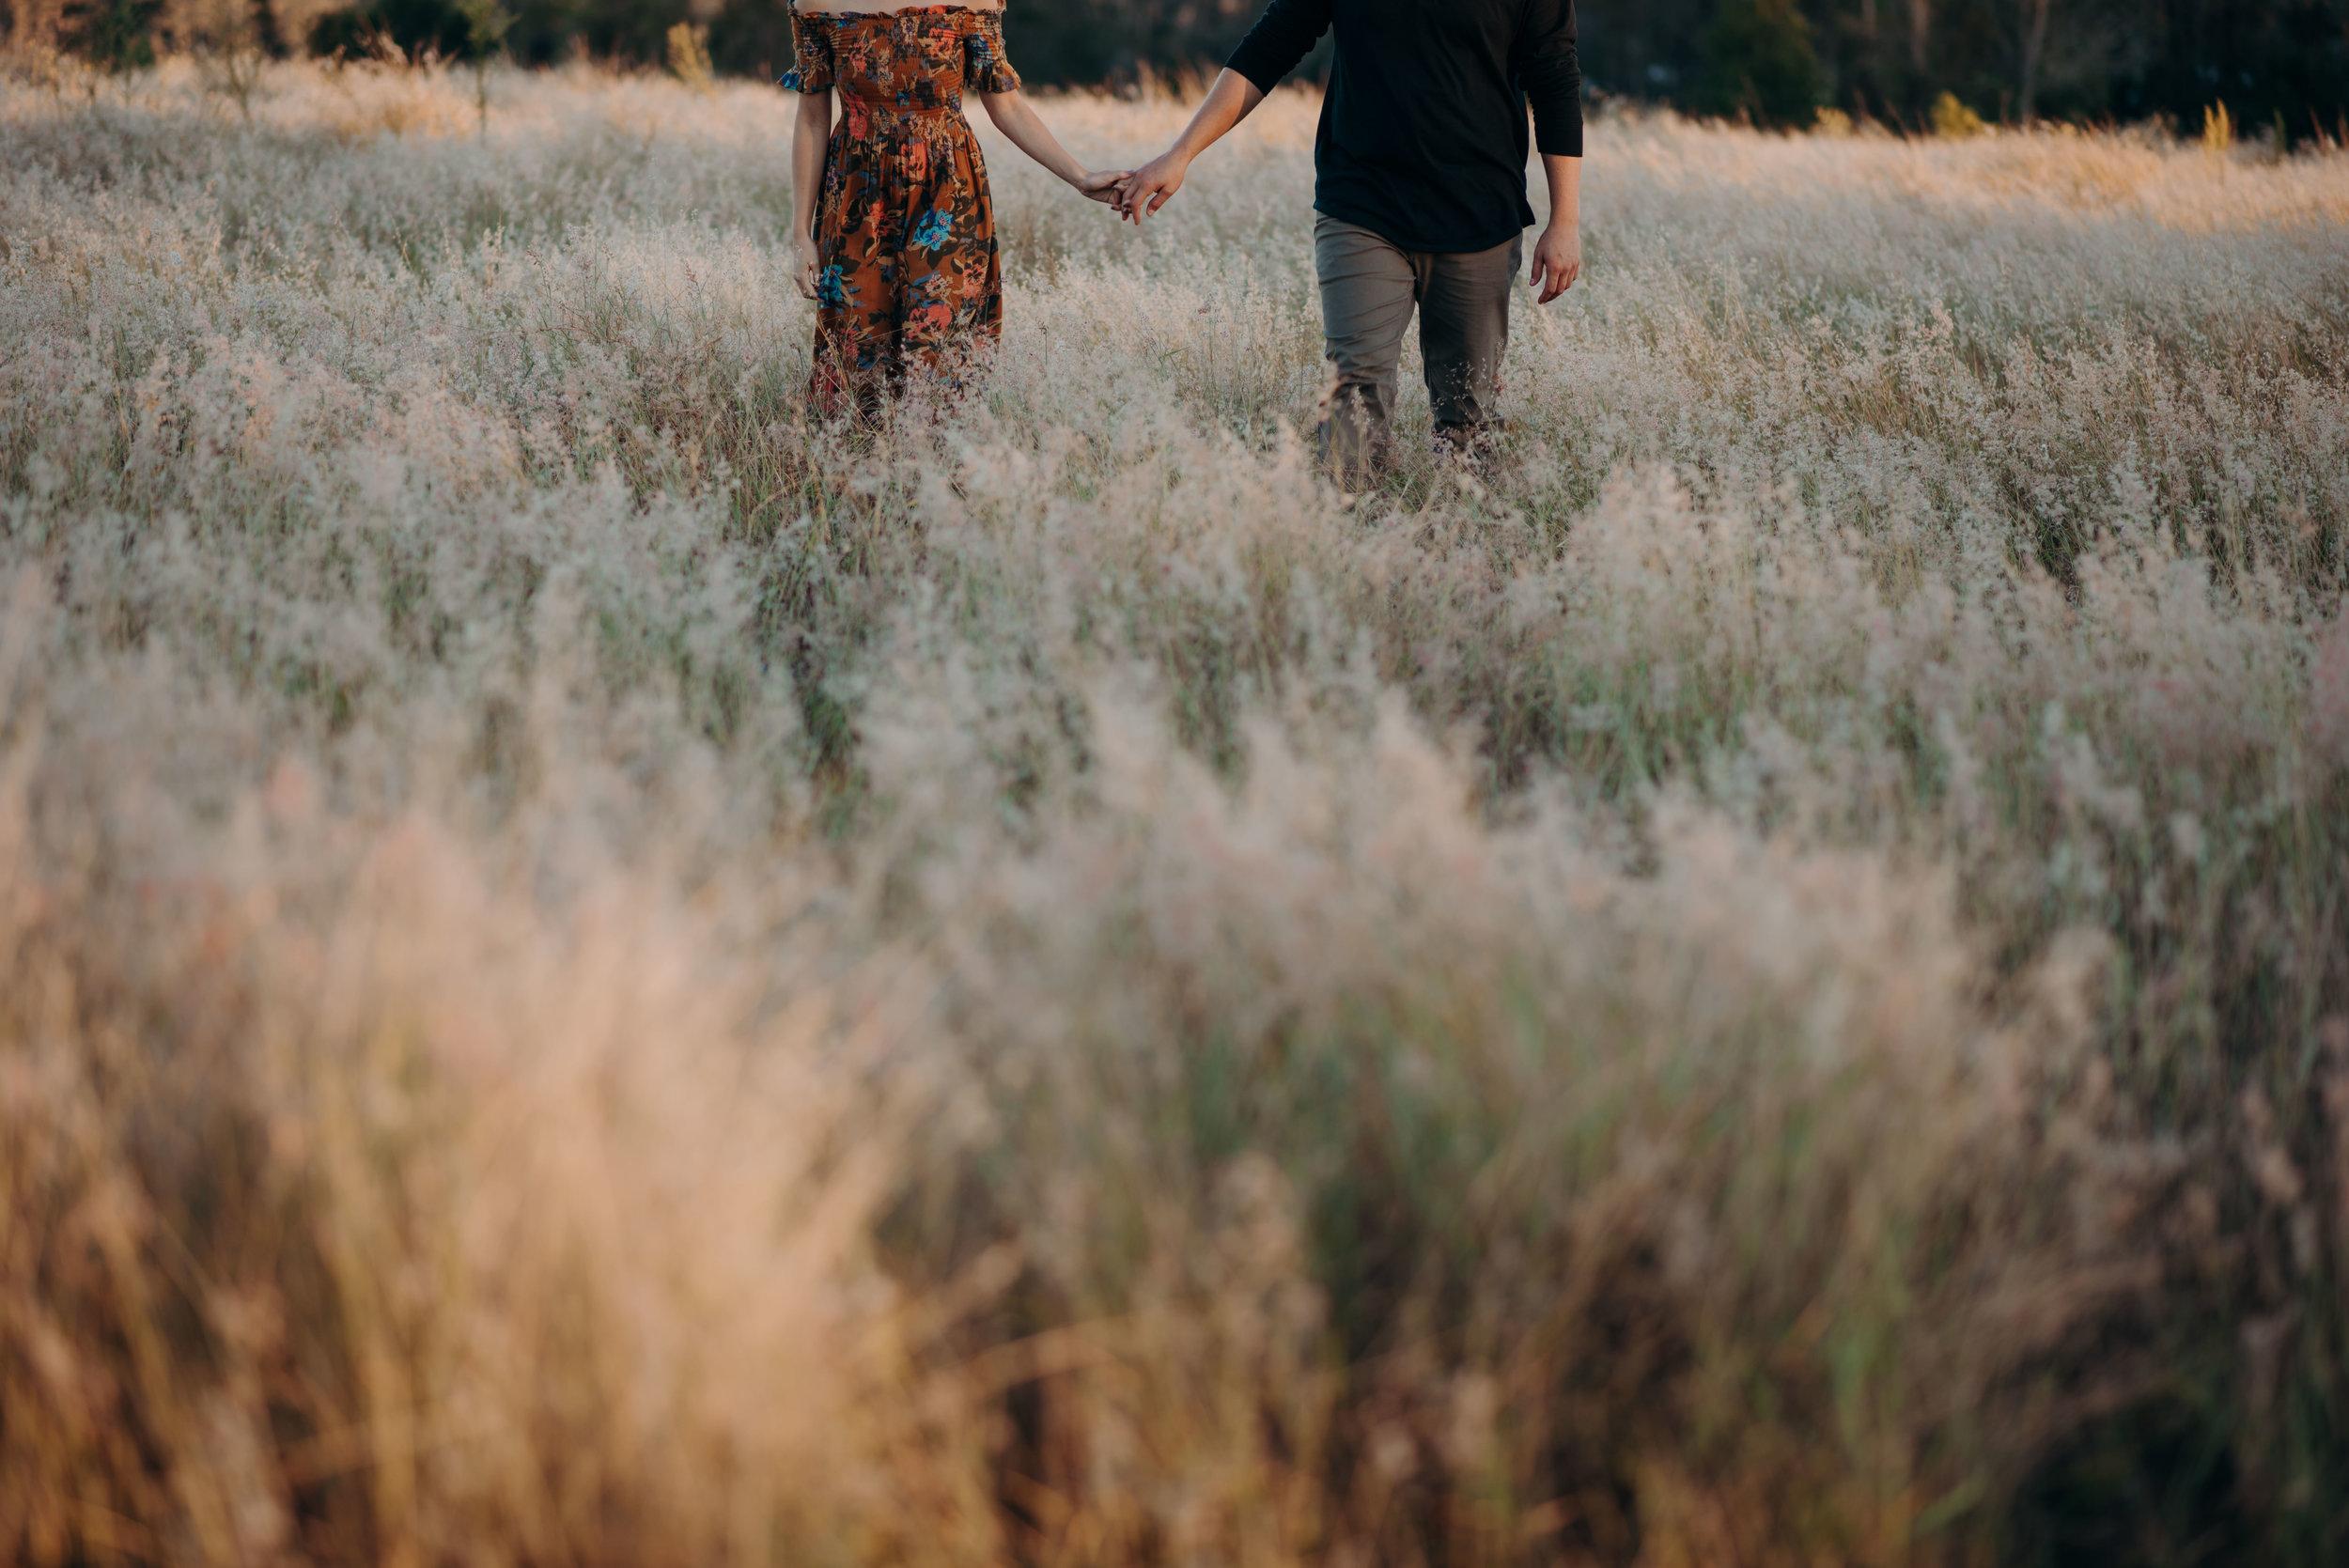 chelsea-julien-lake-louisa-state-park-orlando-florida-engagement-session-192.jpg